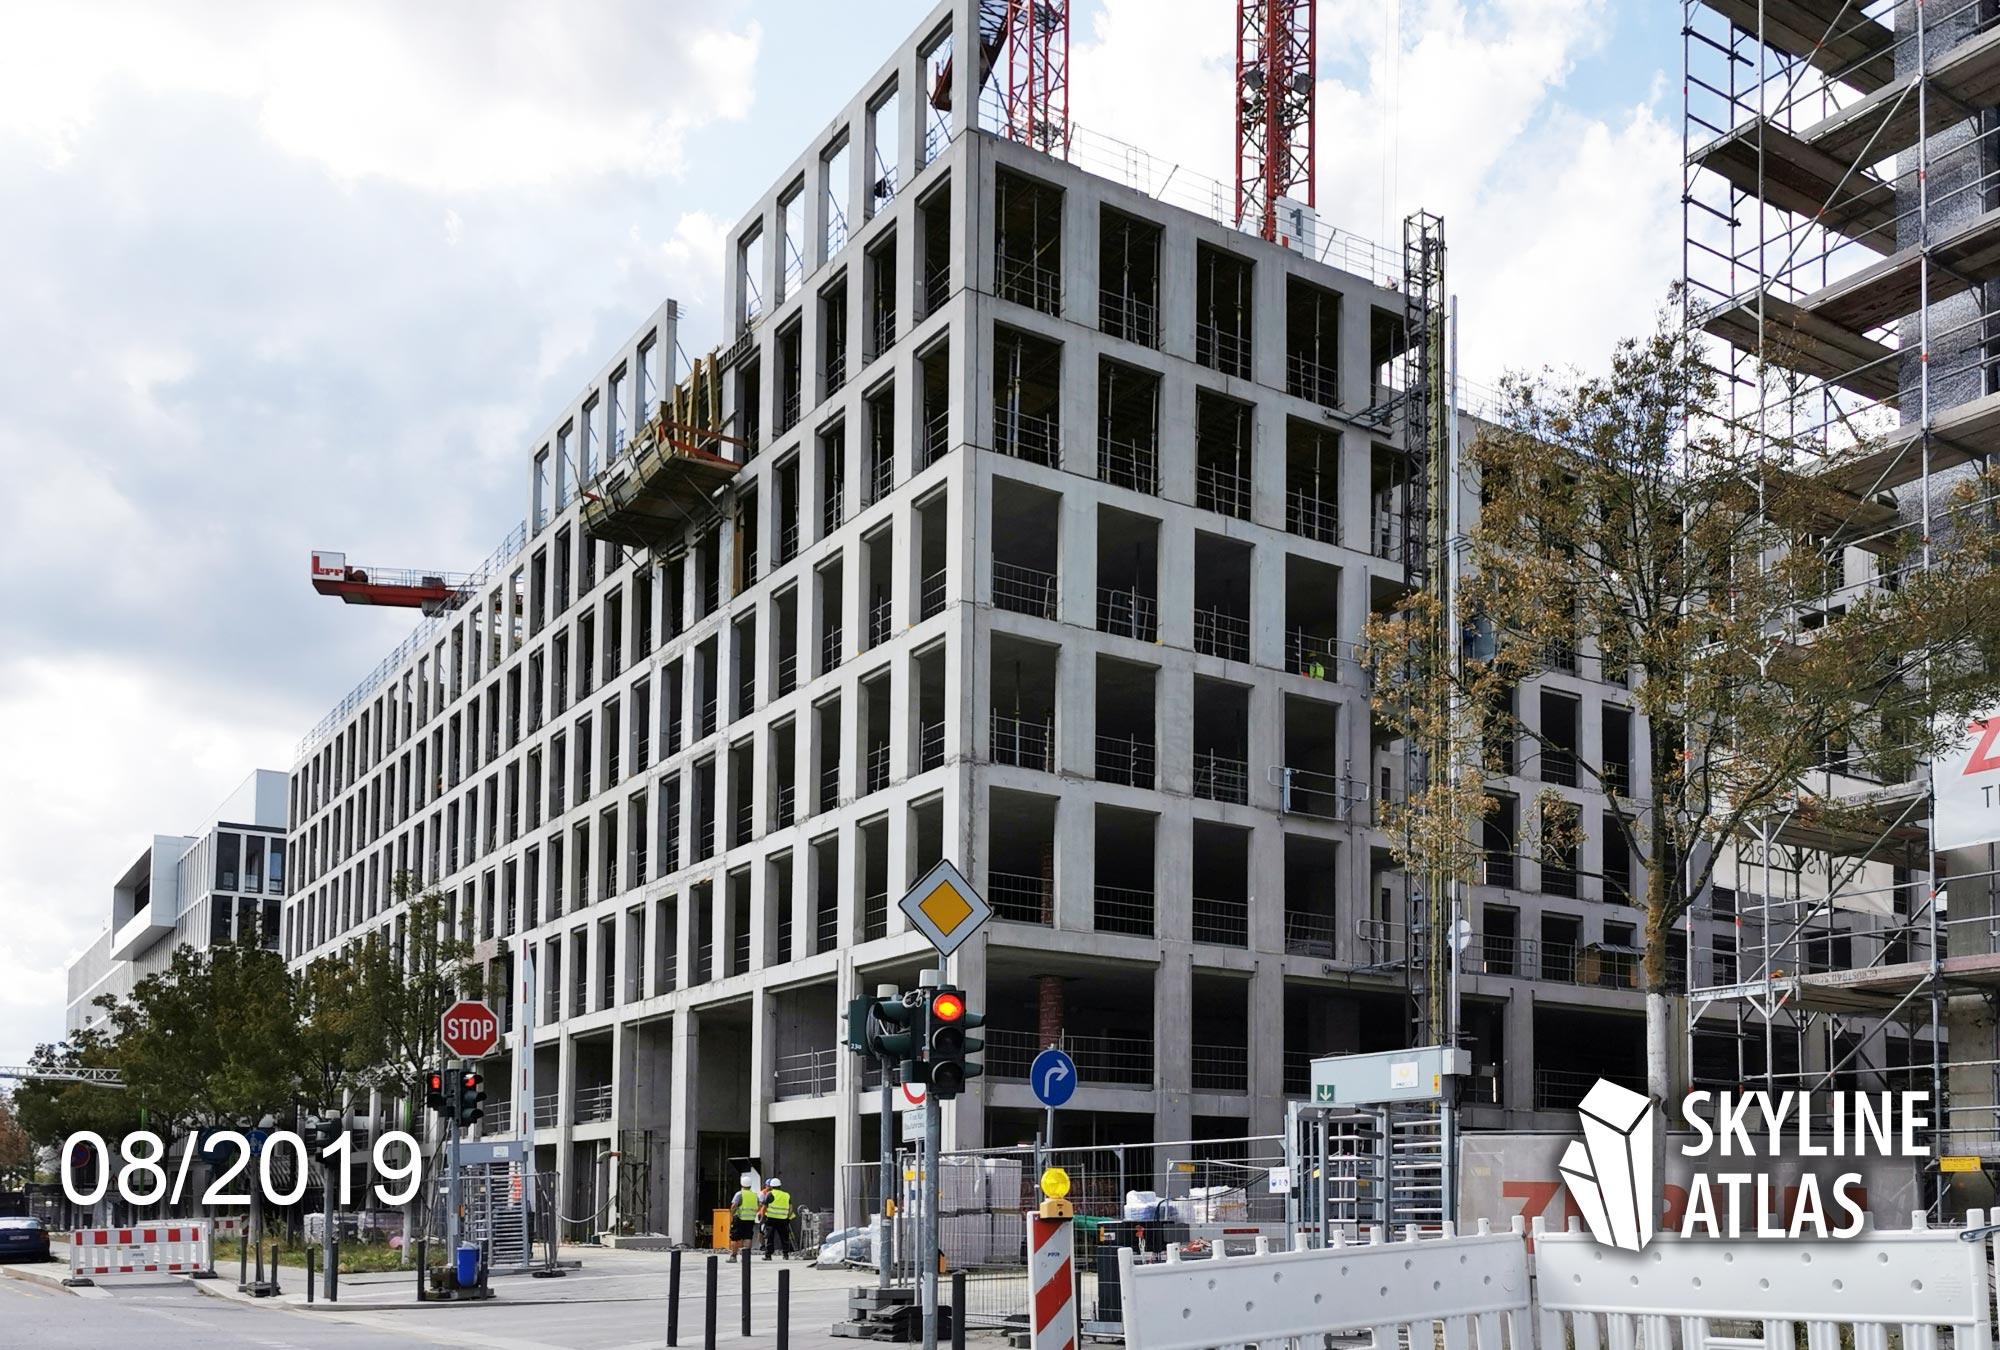 DB Tower - Offices of Deutsche Bahn AG on Europaallee in Frankfurt - High-rise Europaviertel Deutsche Bahn AG - Construction site August 2019